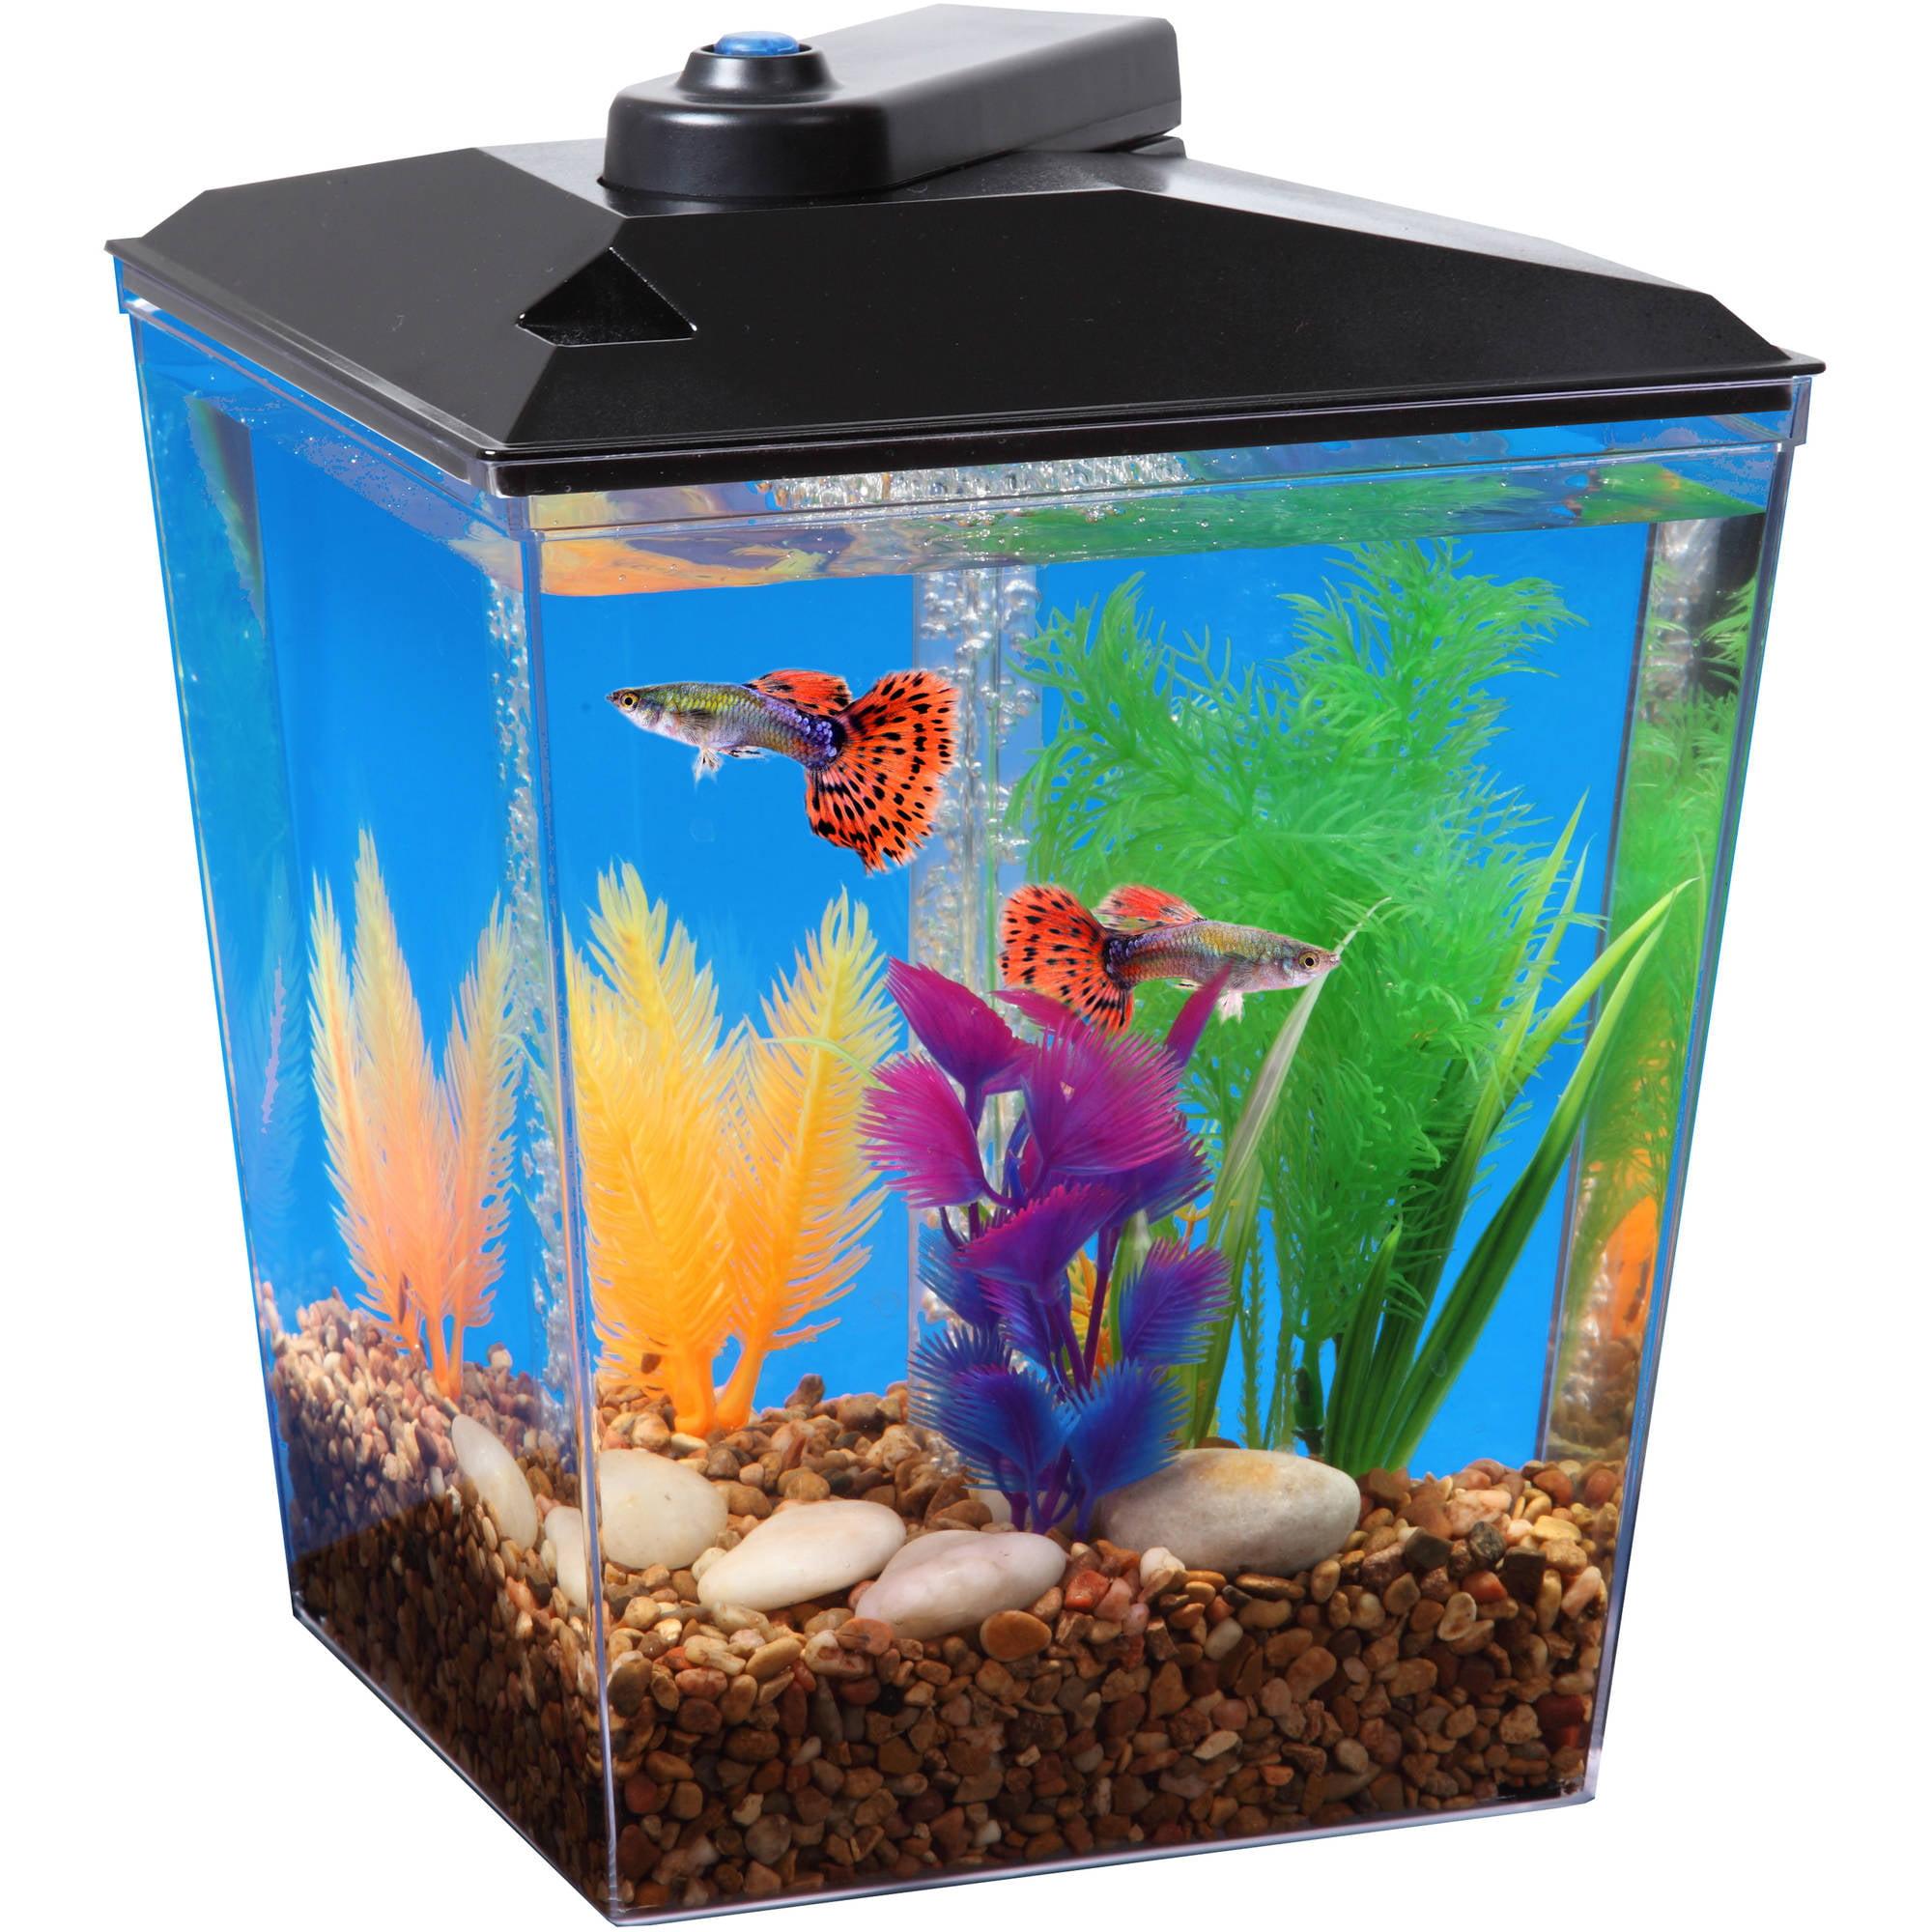 Unique bargains aquarium fish tank light blue artificial for Artificial fish tank